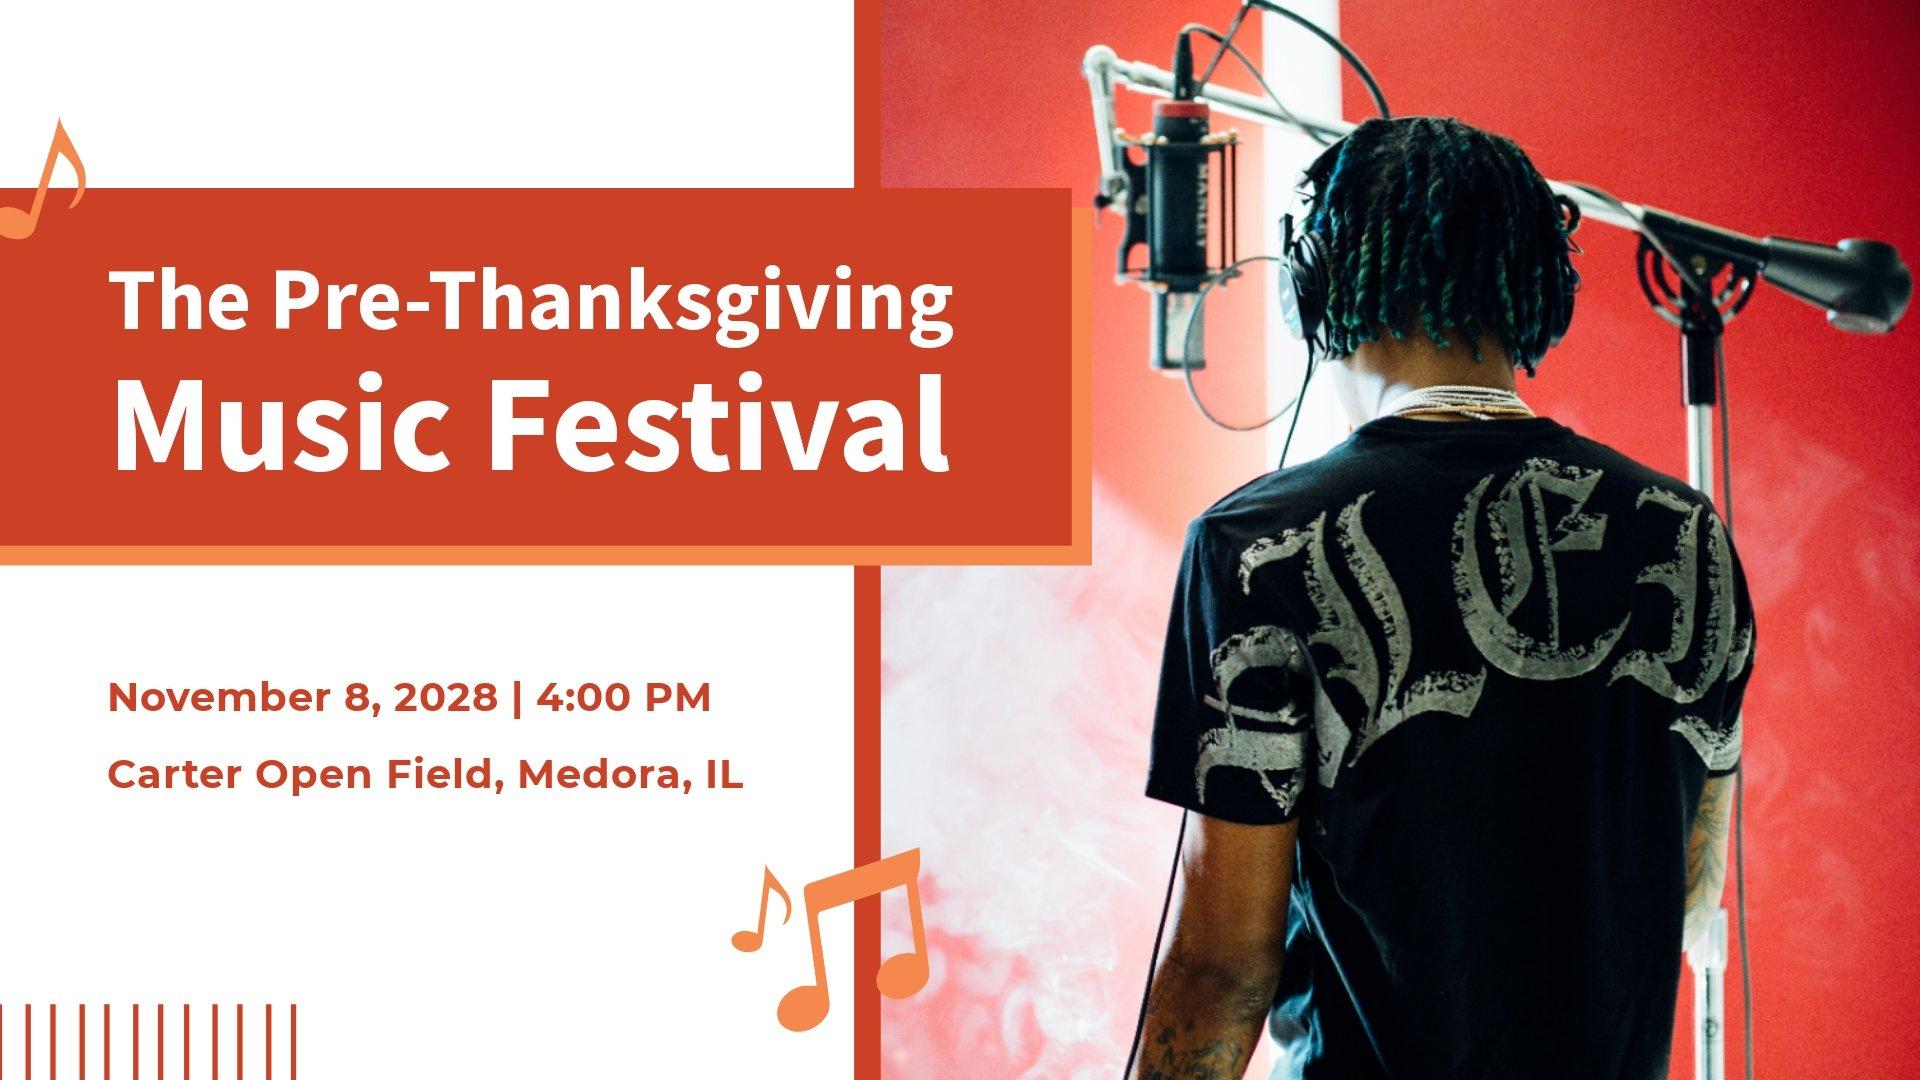 Music Festival Facebook Event Cover Template